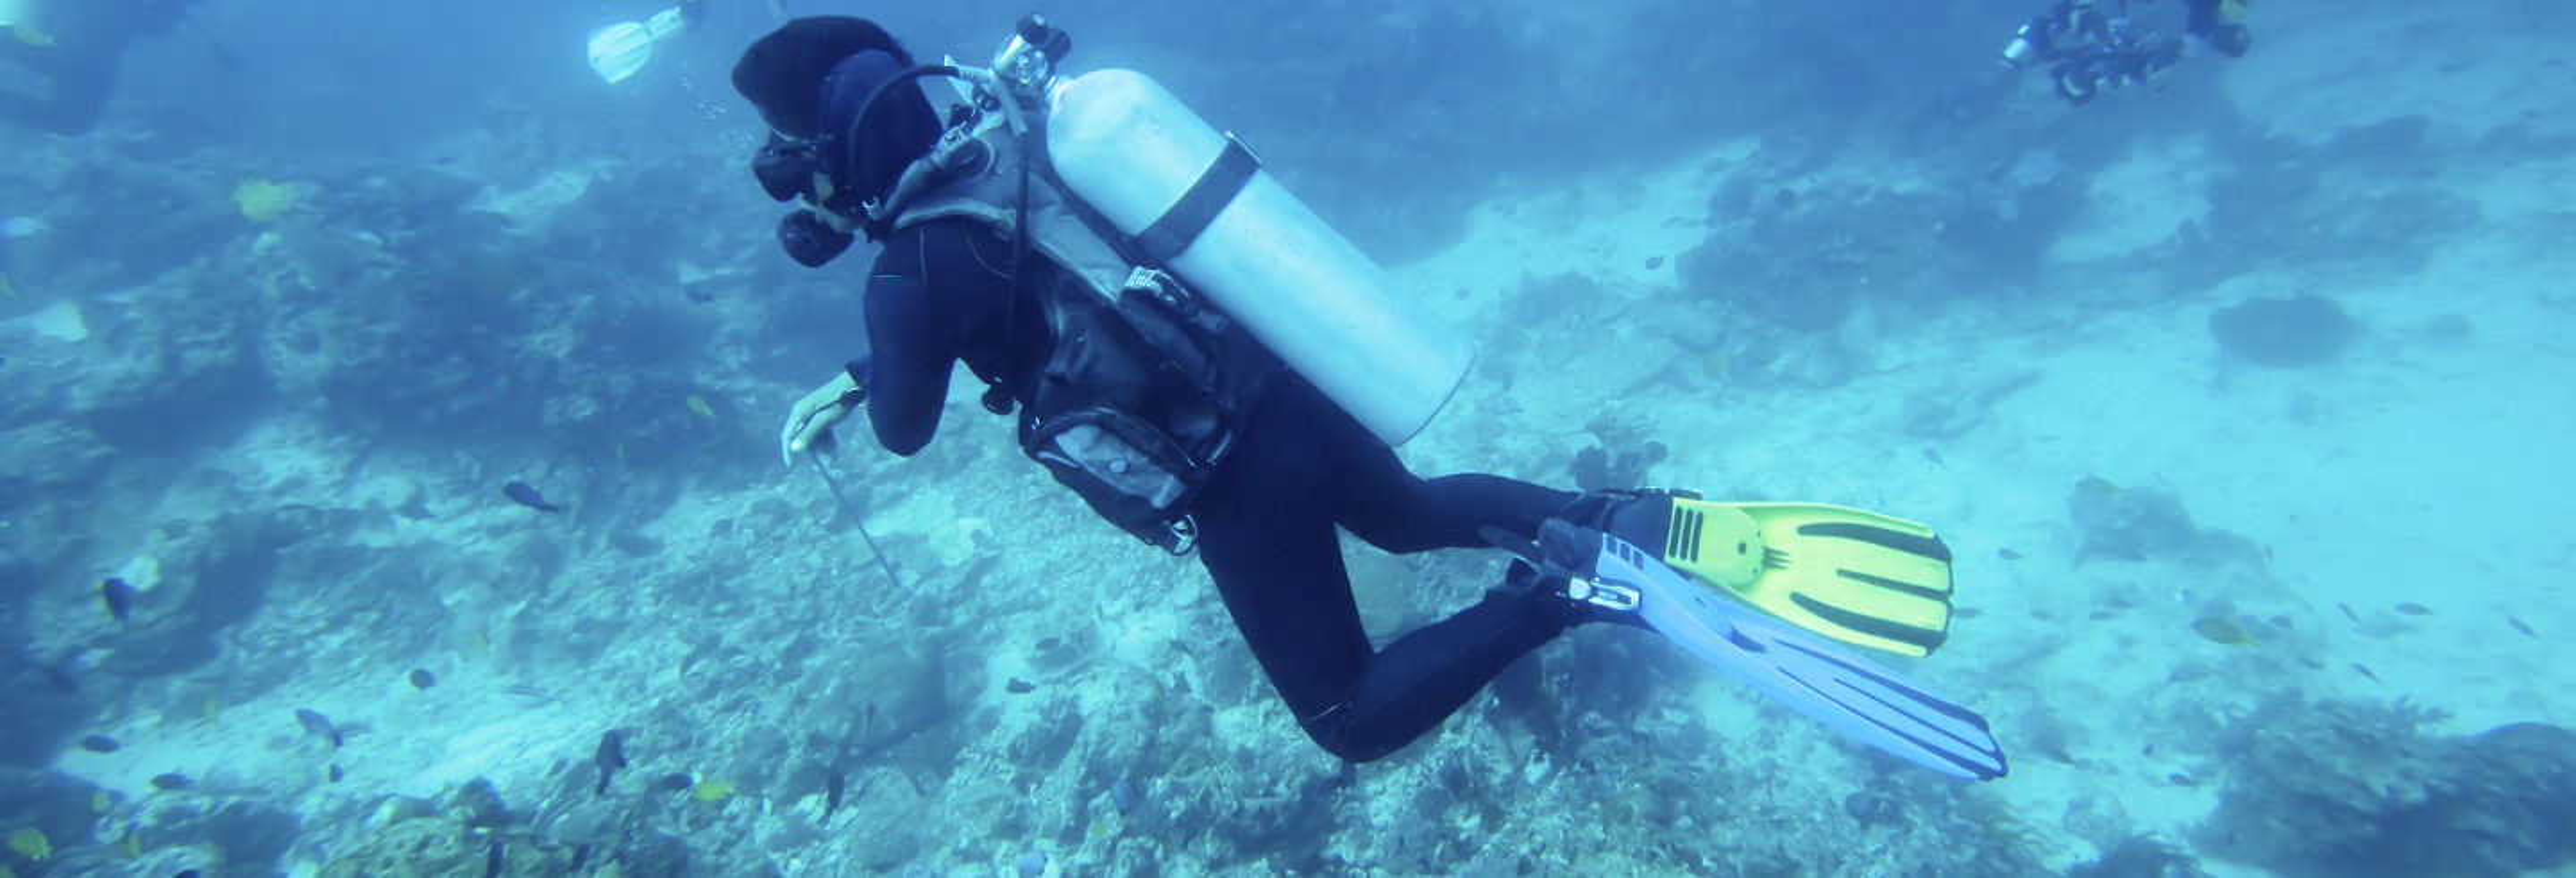 Beginner's Scuba Diving in Bohol